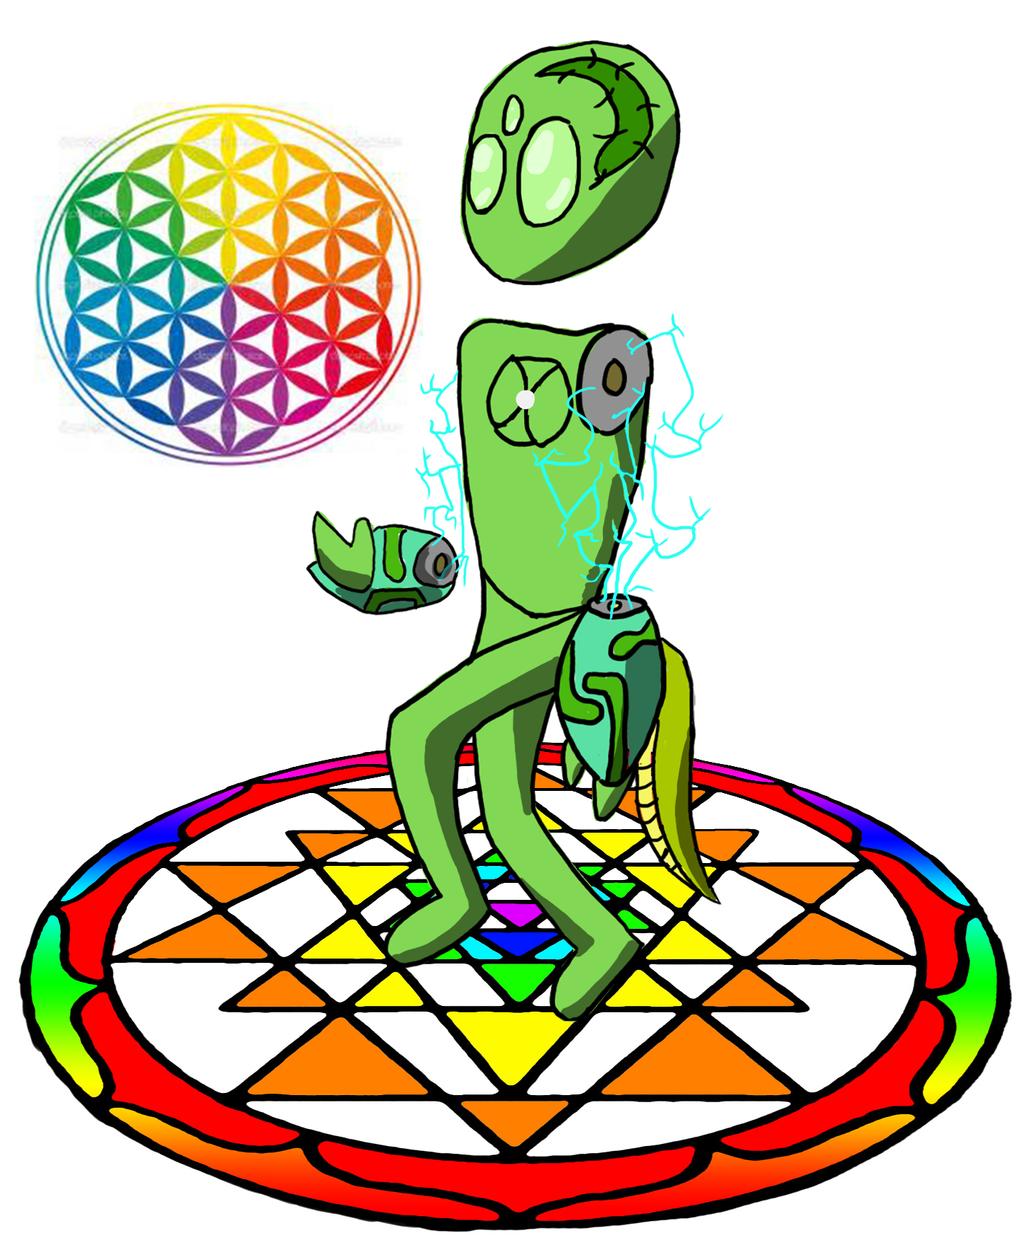 Most recent image: Spiritscience